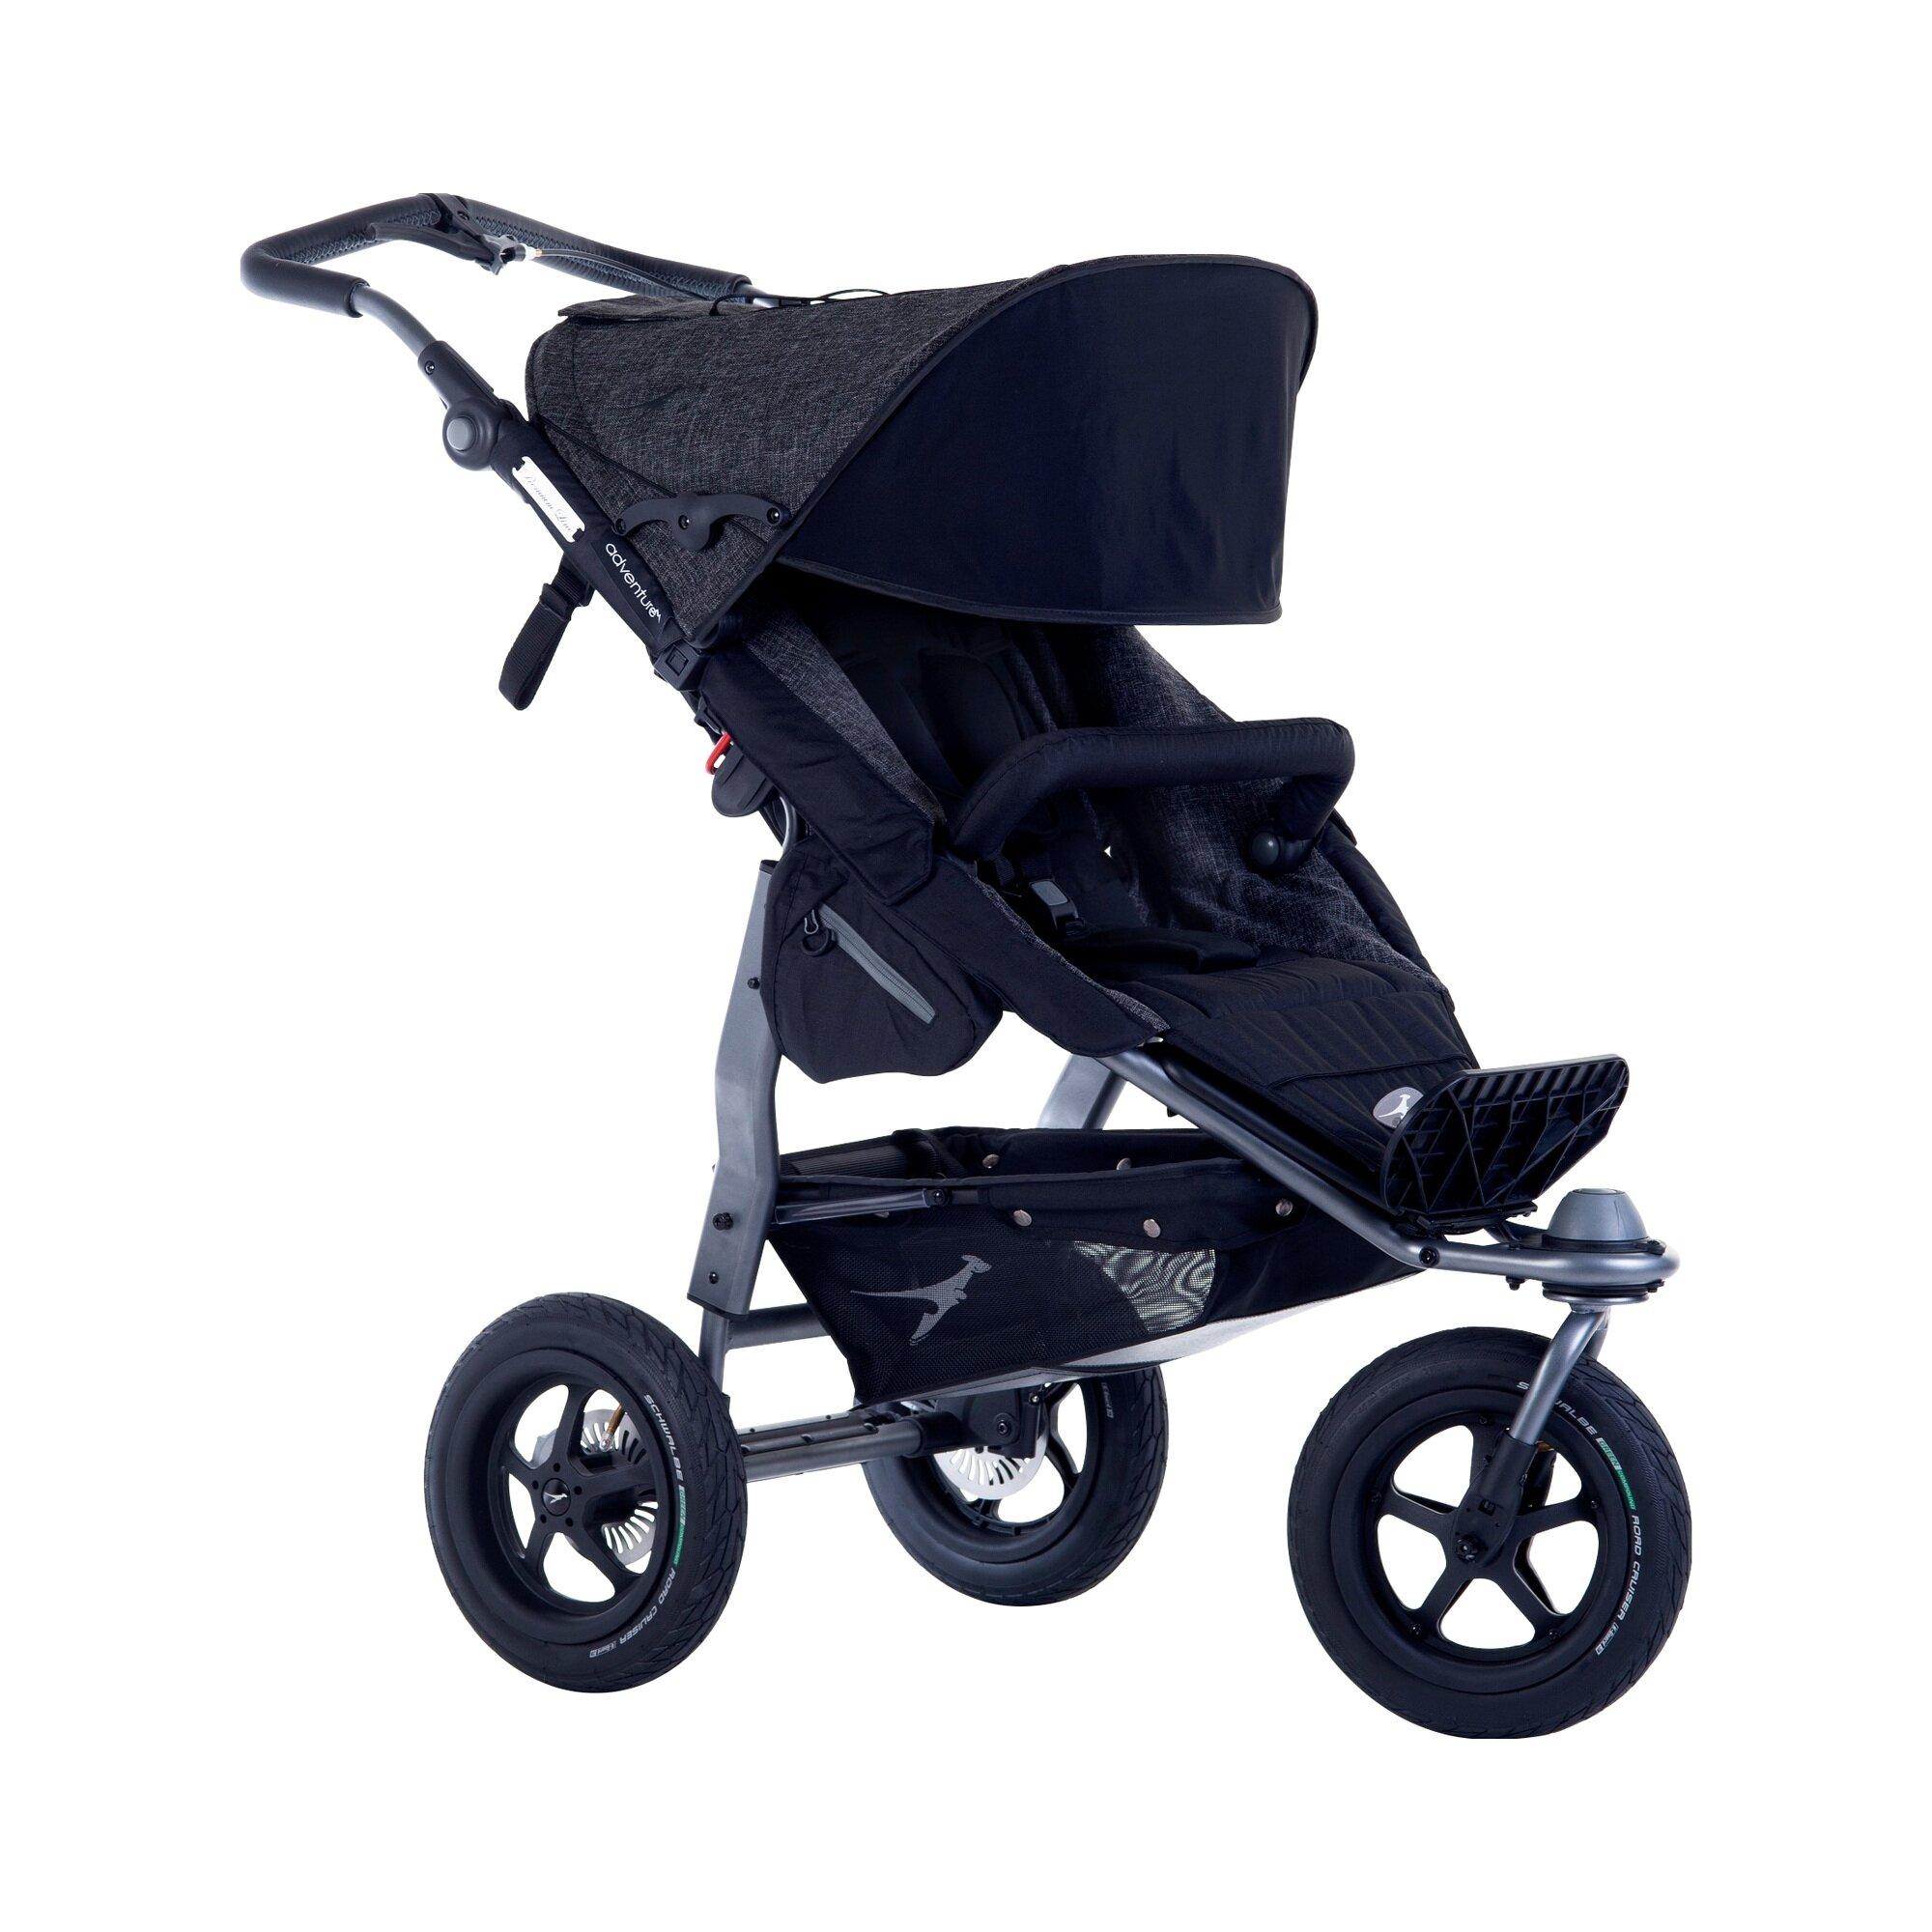 tfk-joggster-adventure-2-premium-kinderwagen-grau